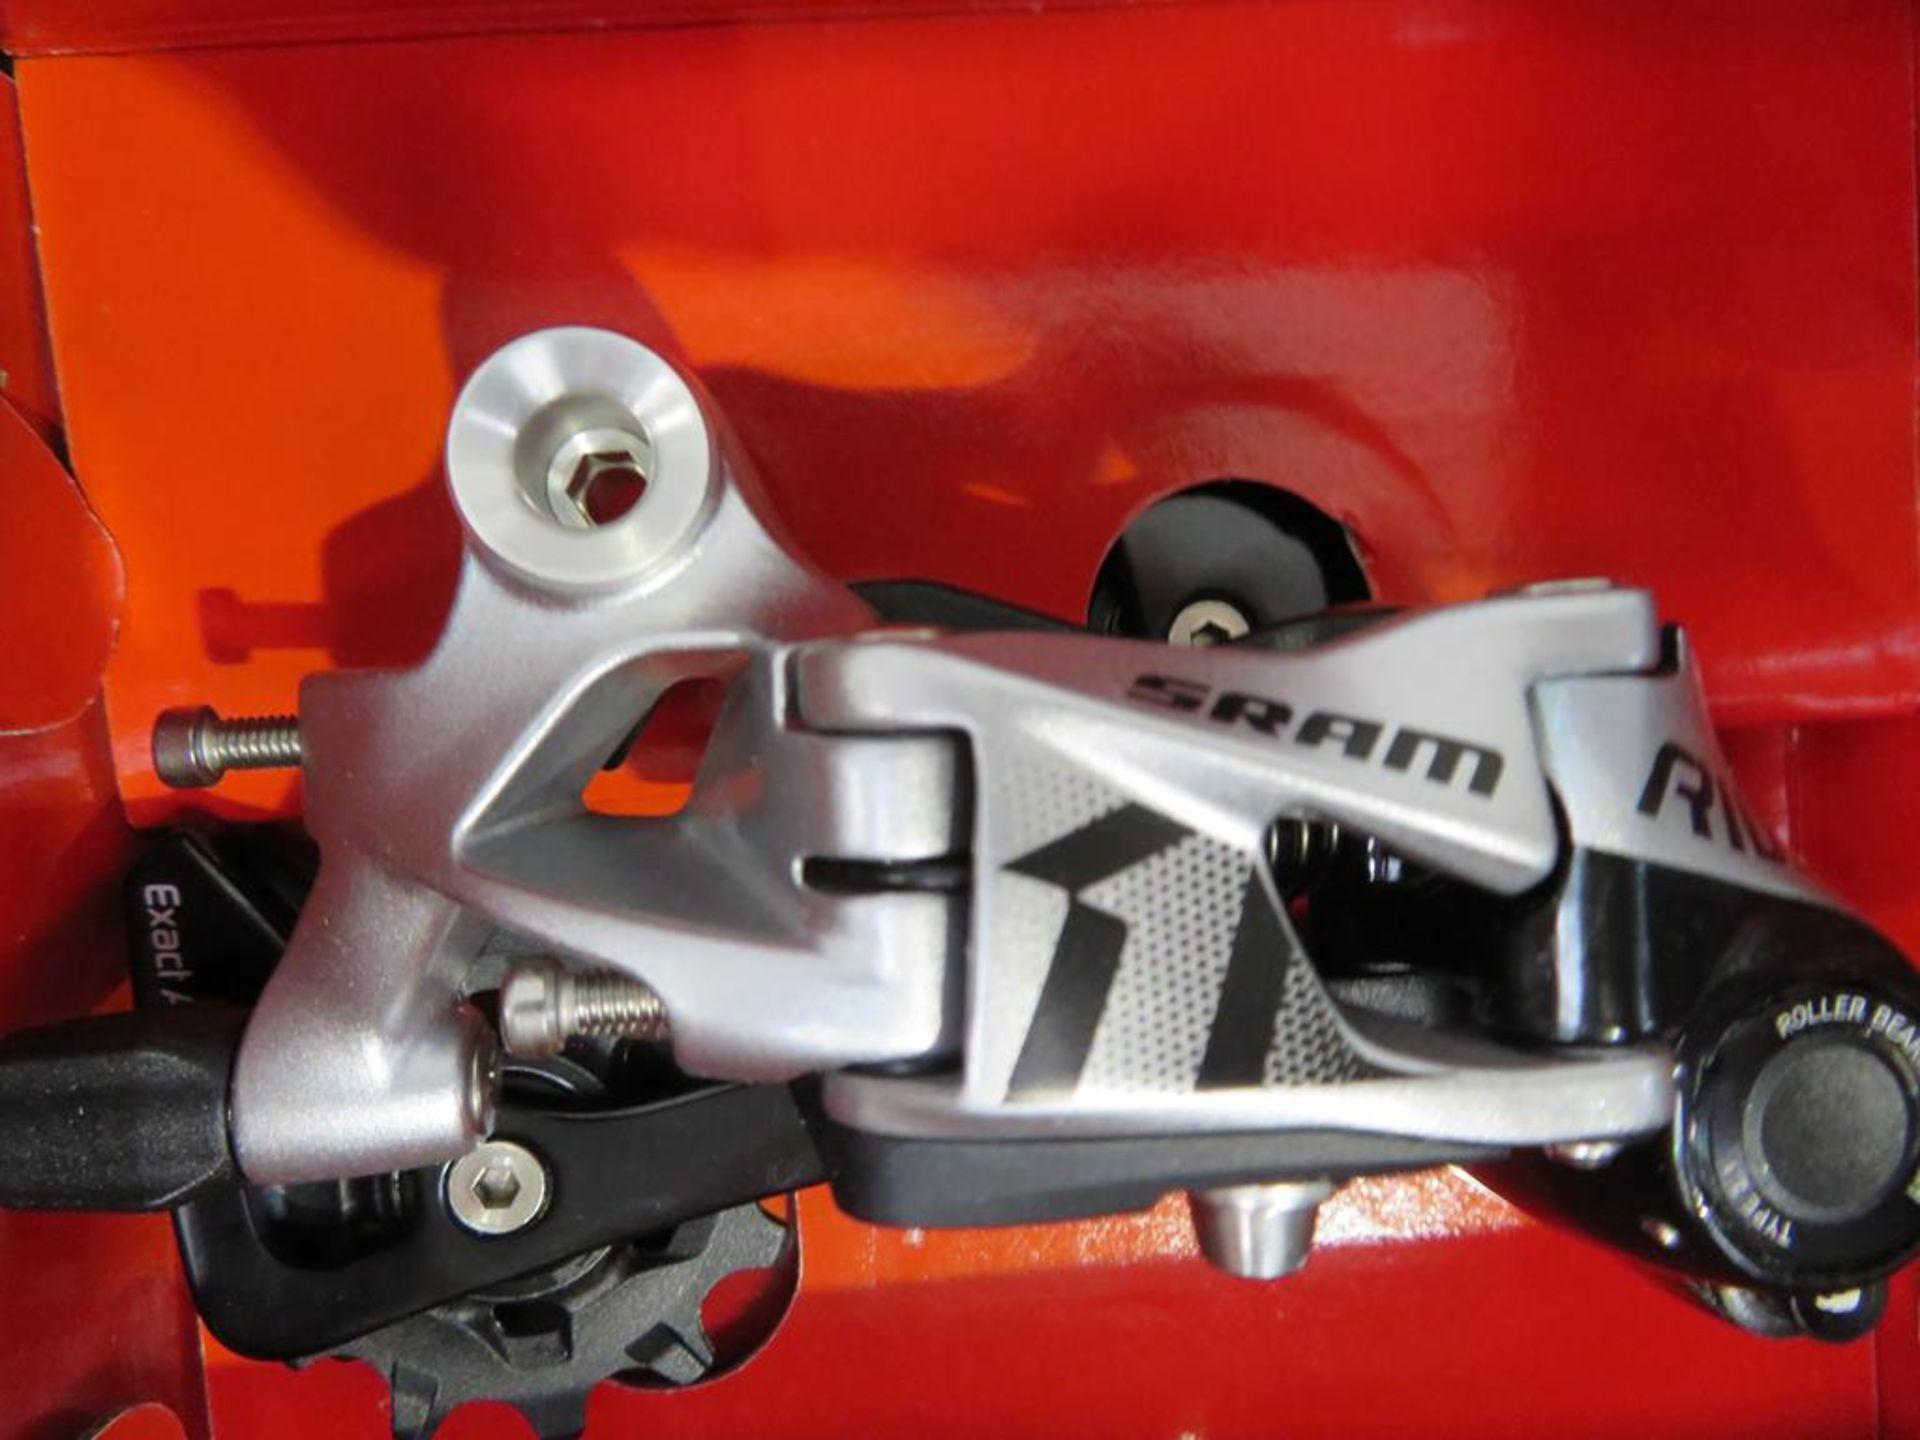 Lot 49 - Sram Rival 1 11 Speed Rear Derailleur